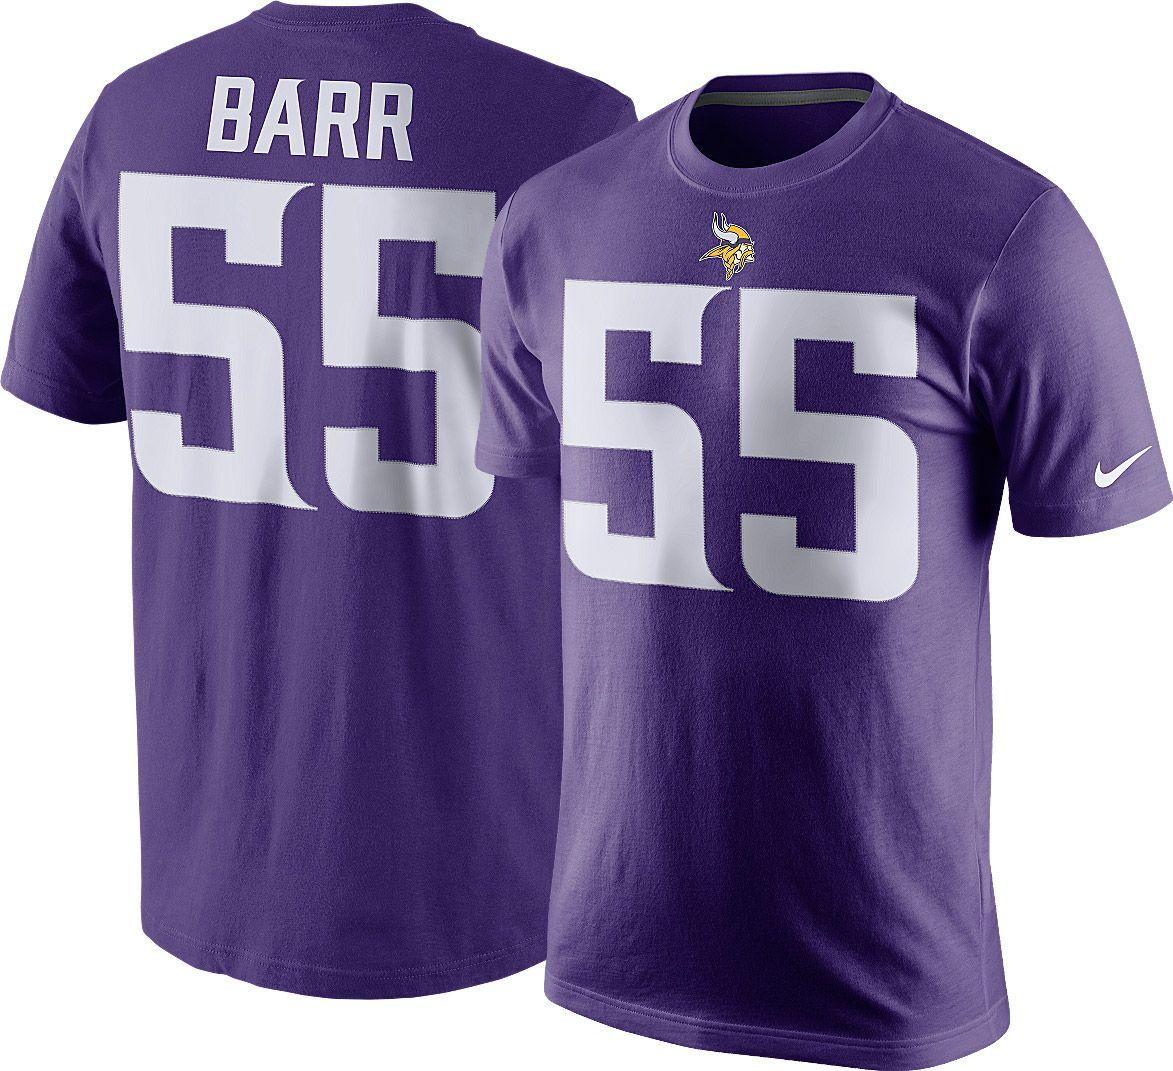 f21d3cca88e ... Elite Stitched NCAA Jersey Nike Mens Minnesota Vikings Anthony Barr 55  Pride Purple T-S ...